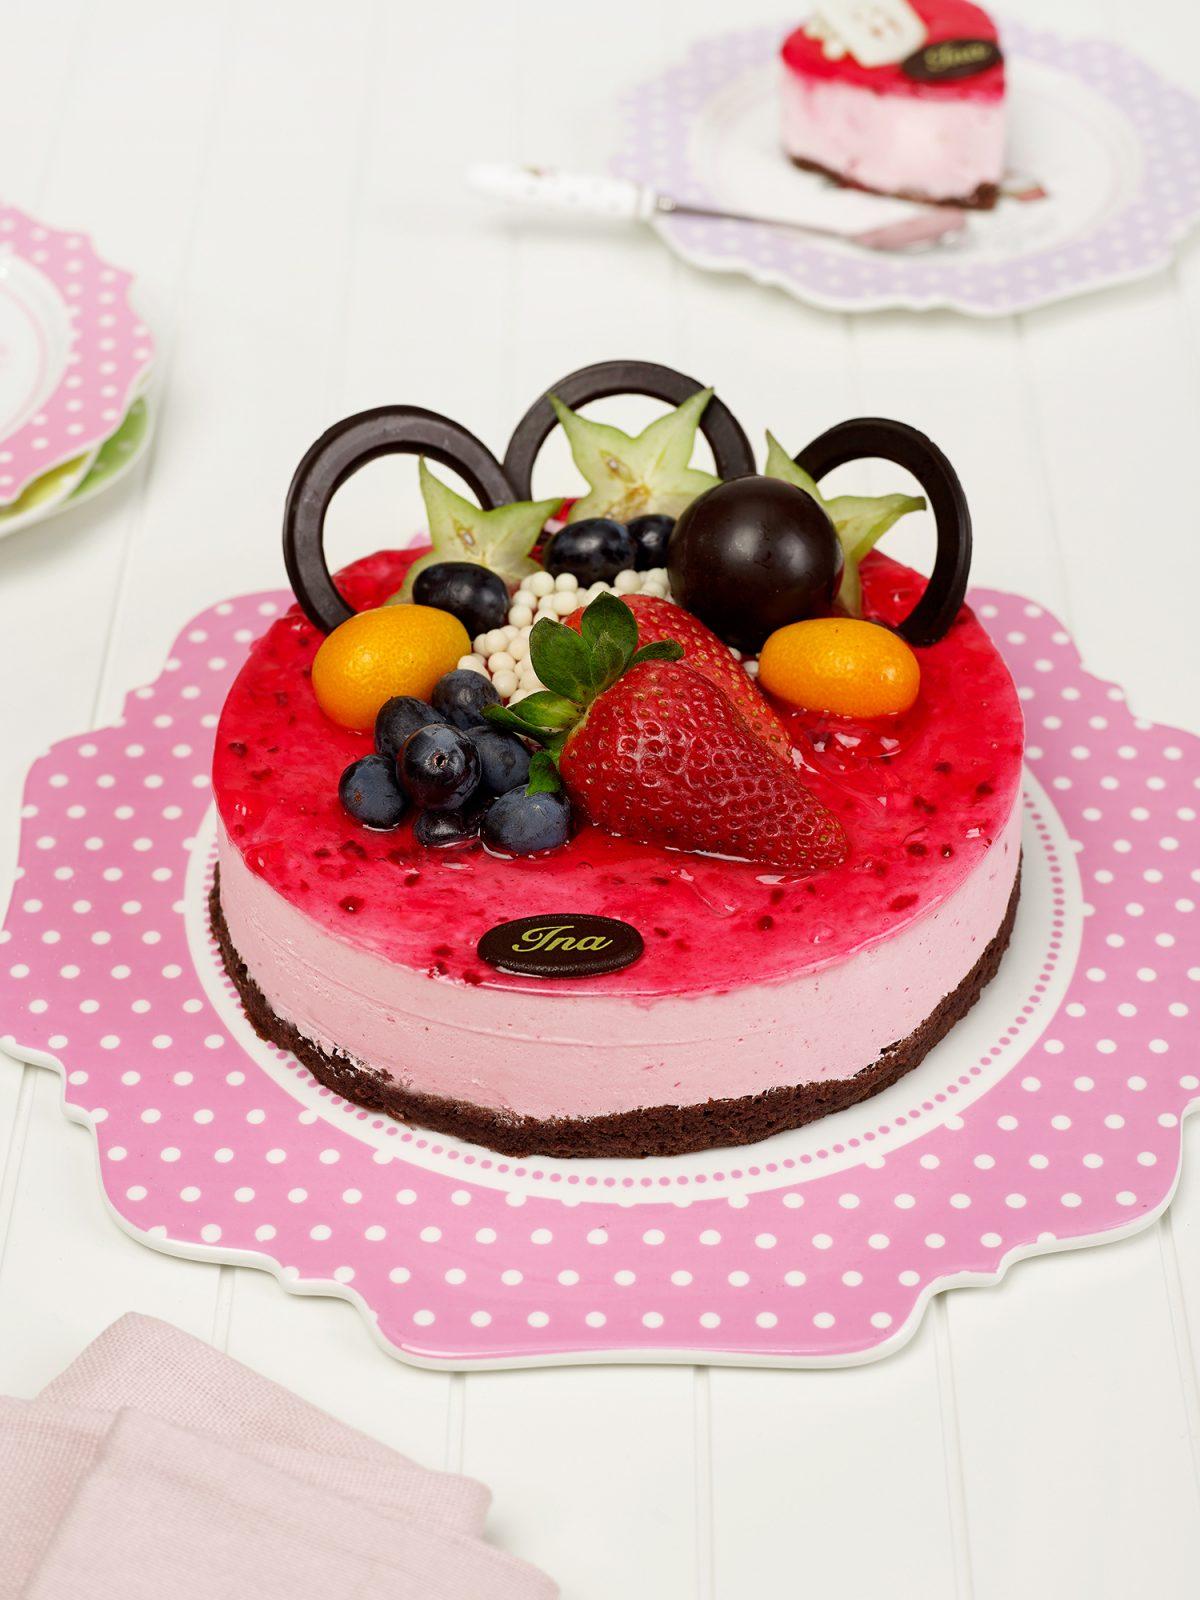 Tort de mascarpone cu zmeura/ fructe de padure - Cofetaria